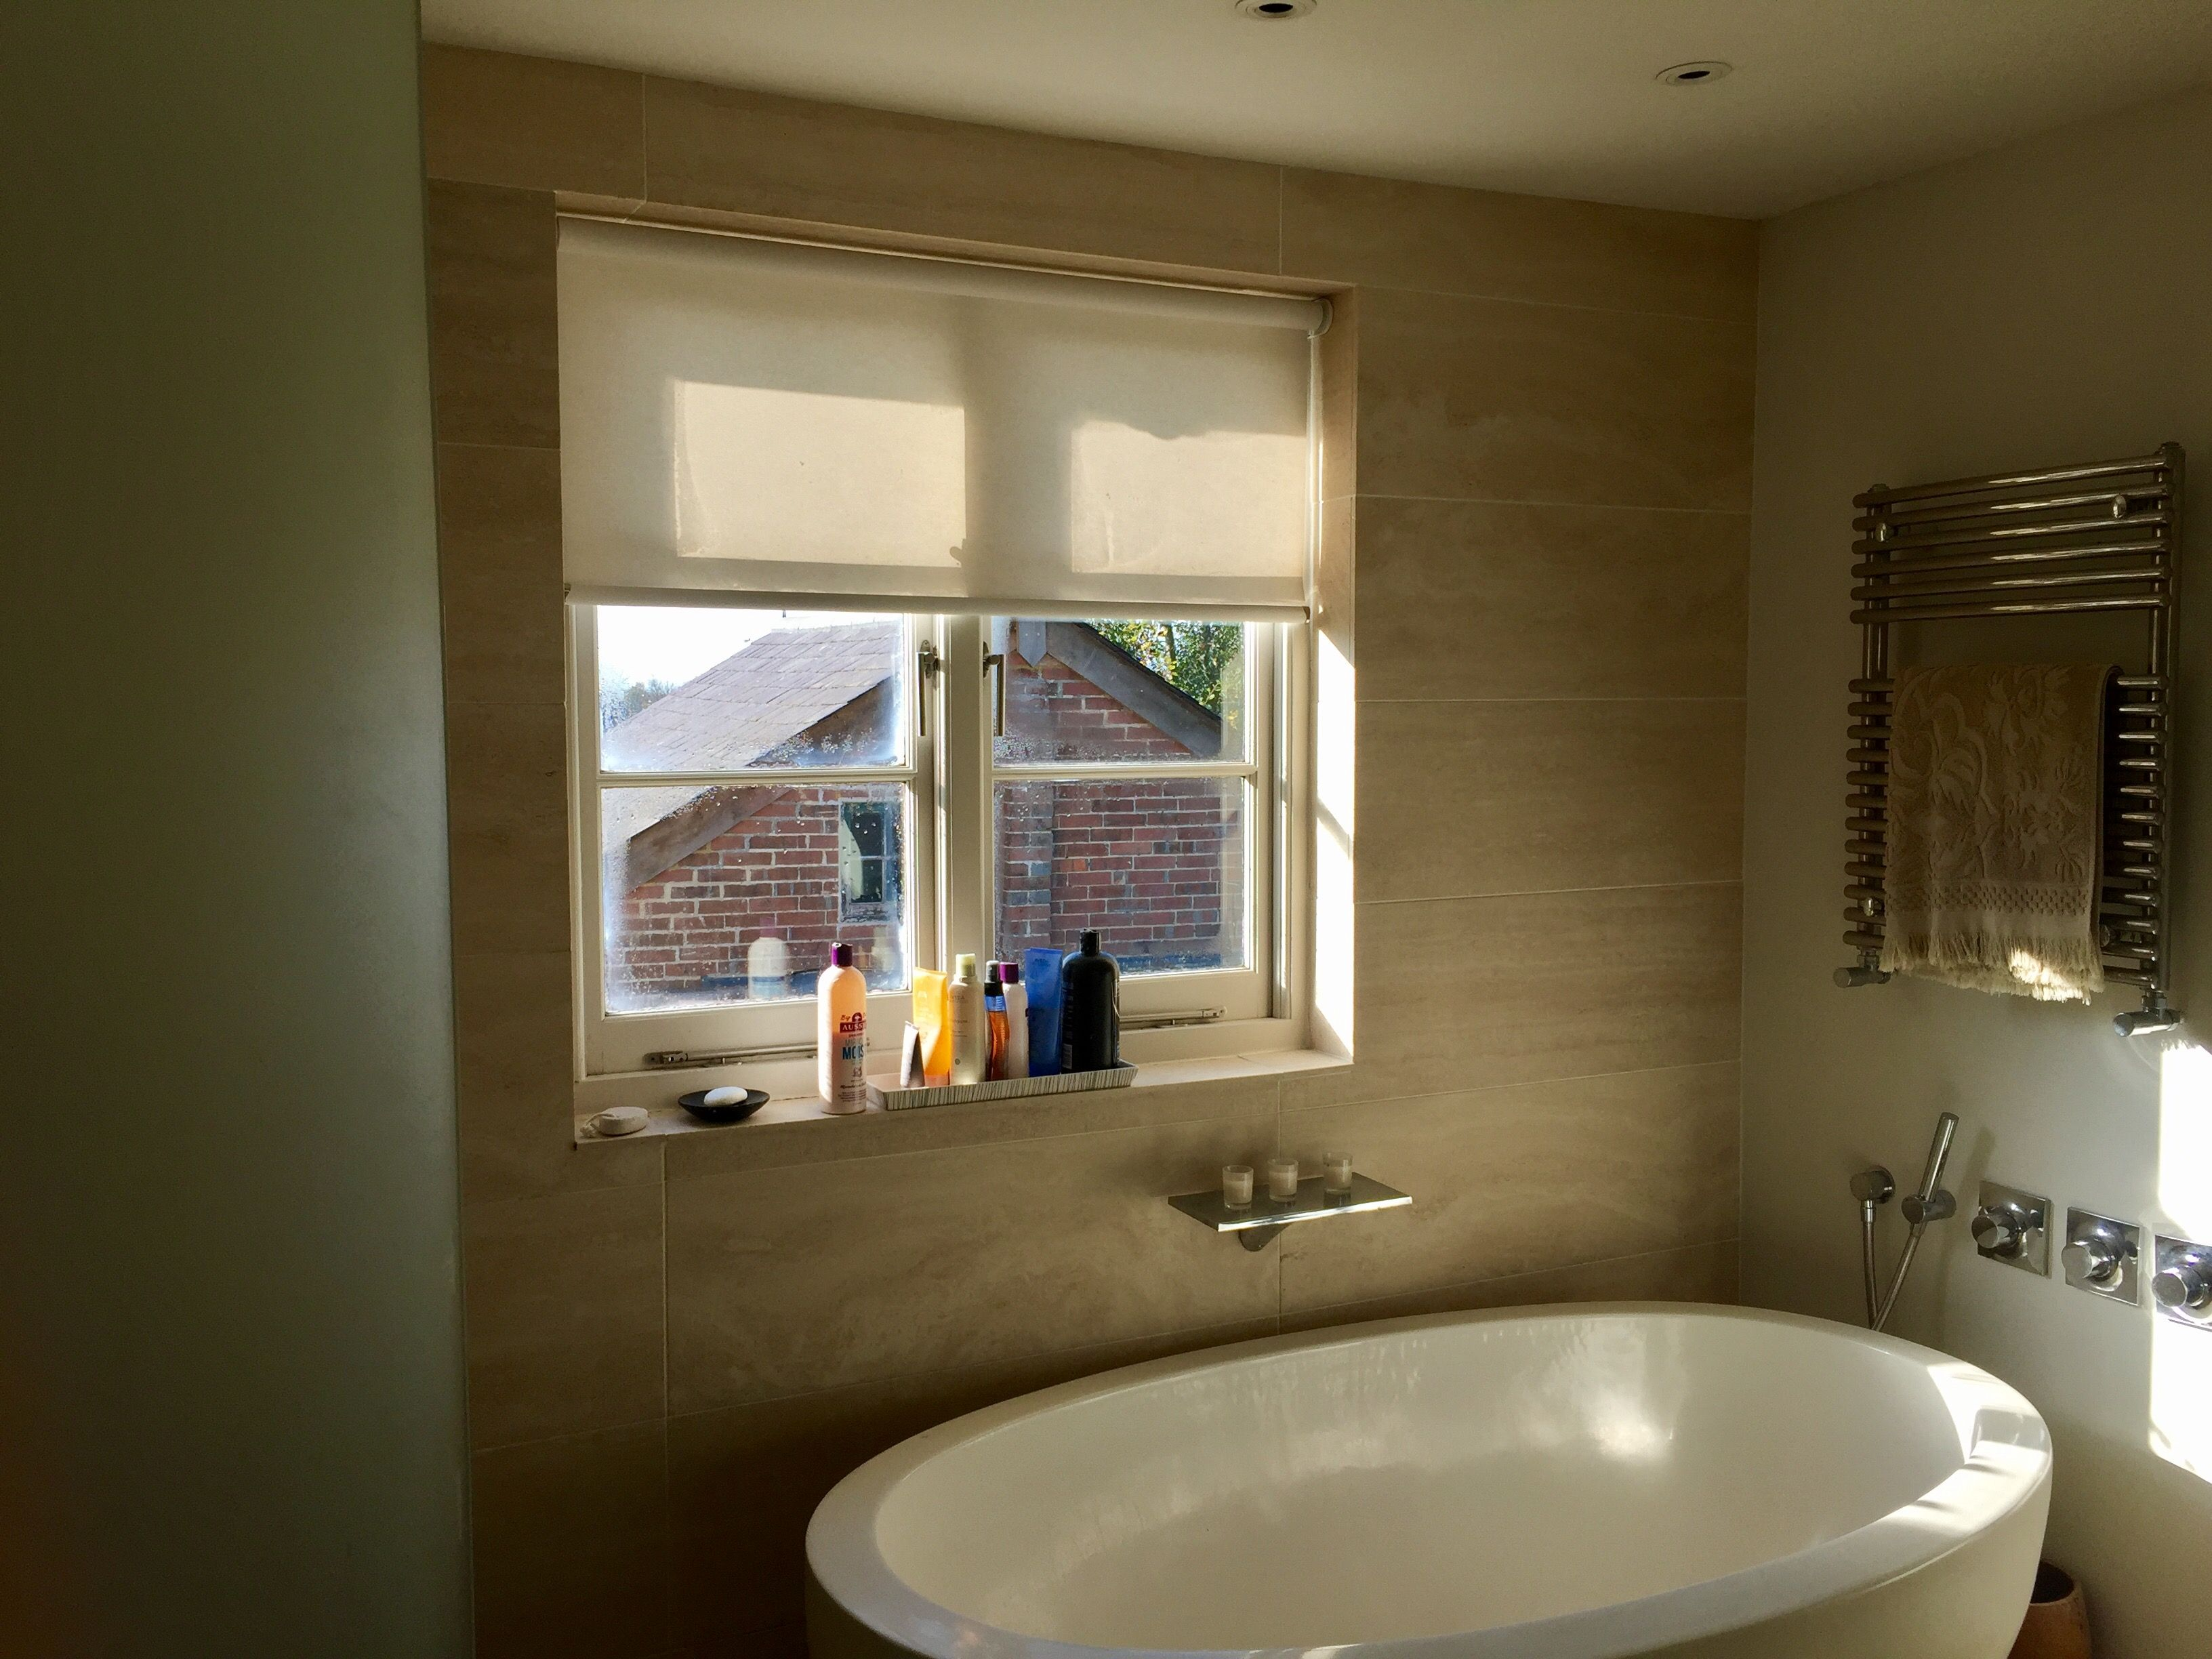 Waterproof Roller Blind For Bathroom Window | Sussex | Made To Measure